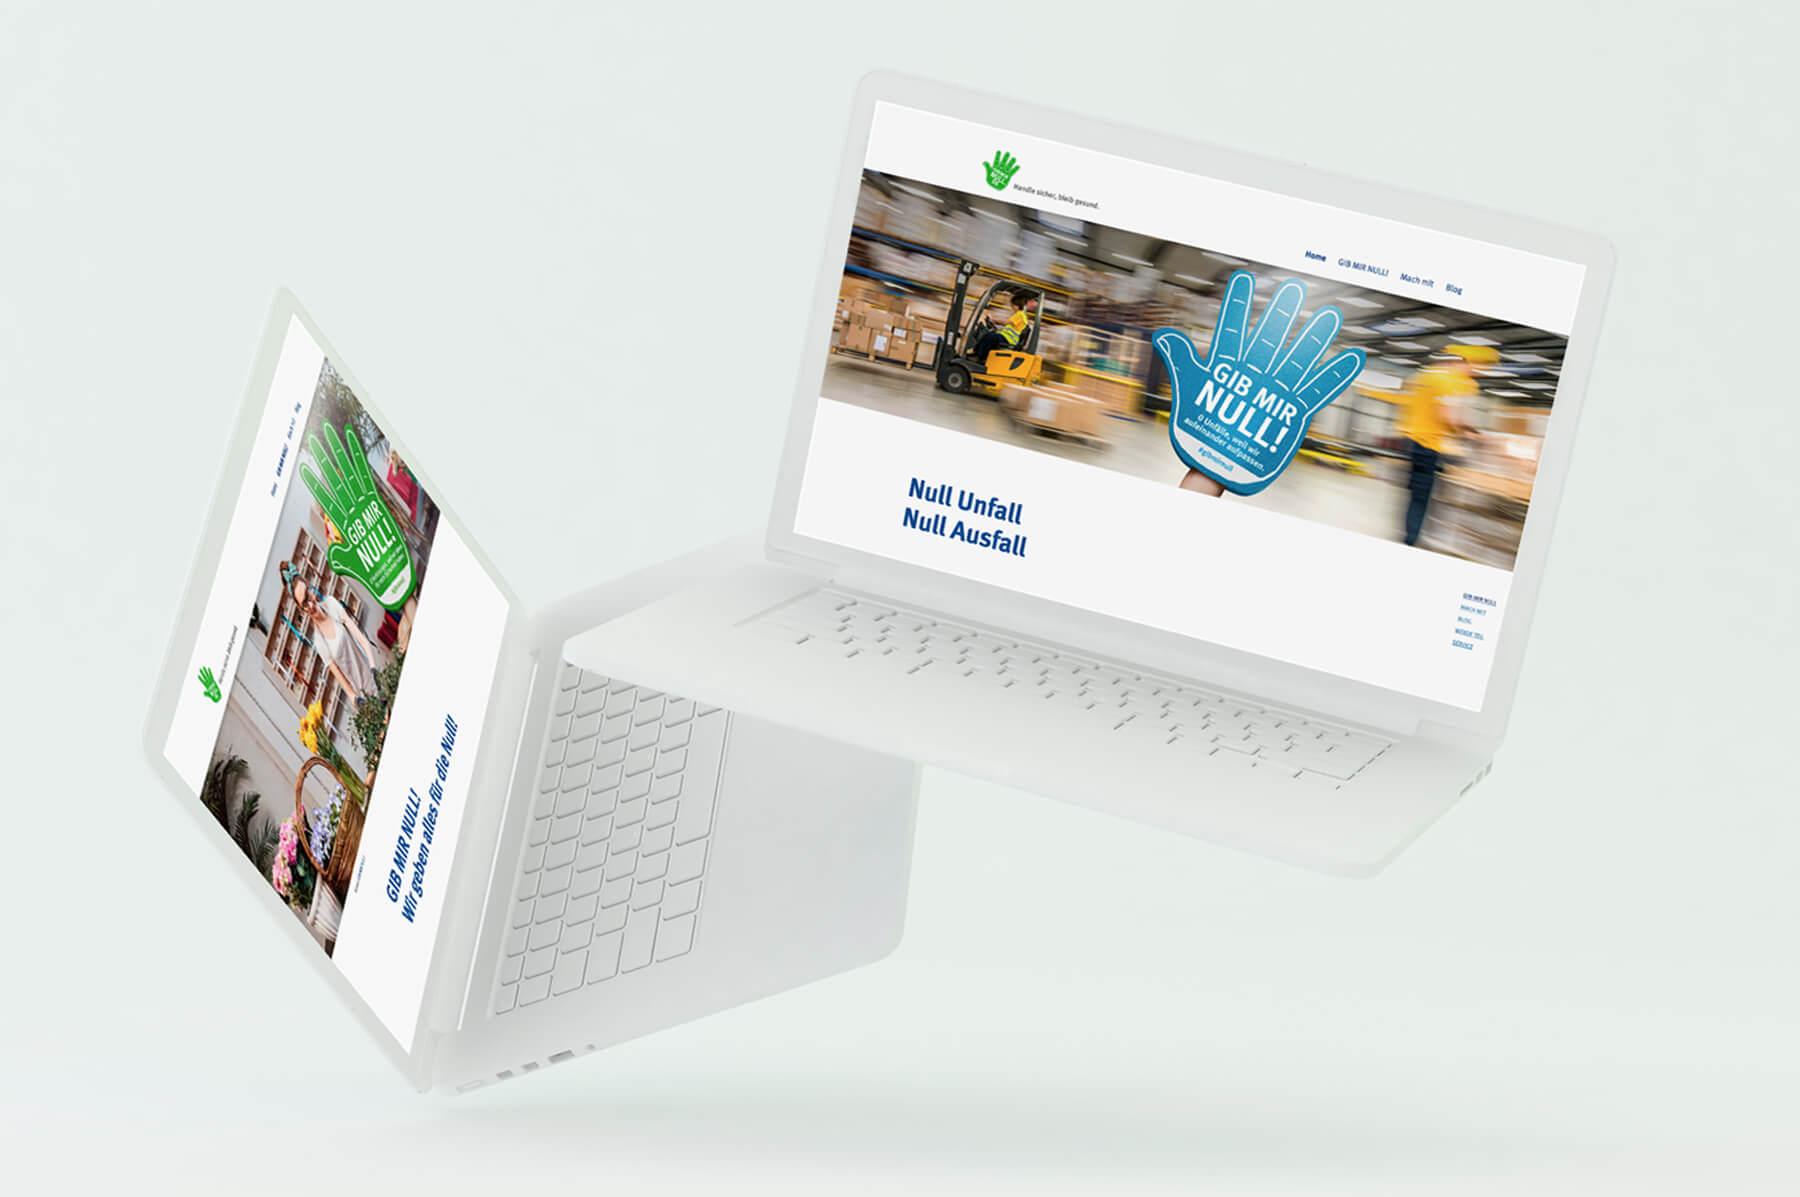 BGHW Bonn Gib mir null Kampagne Aktions-Website Webdesign Wordpress